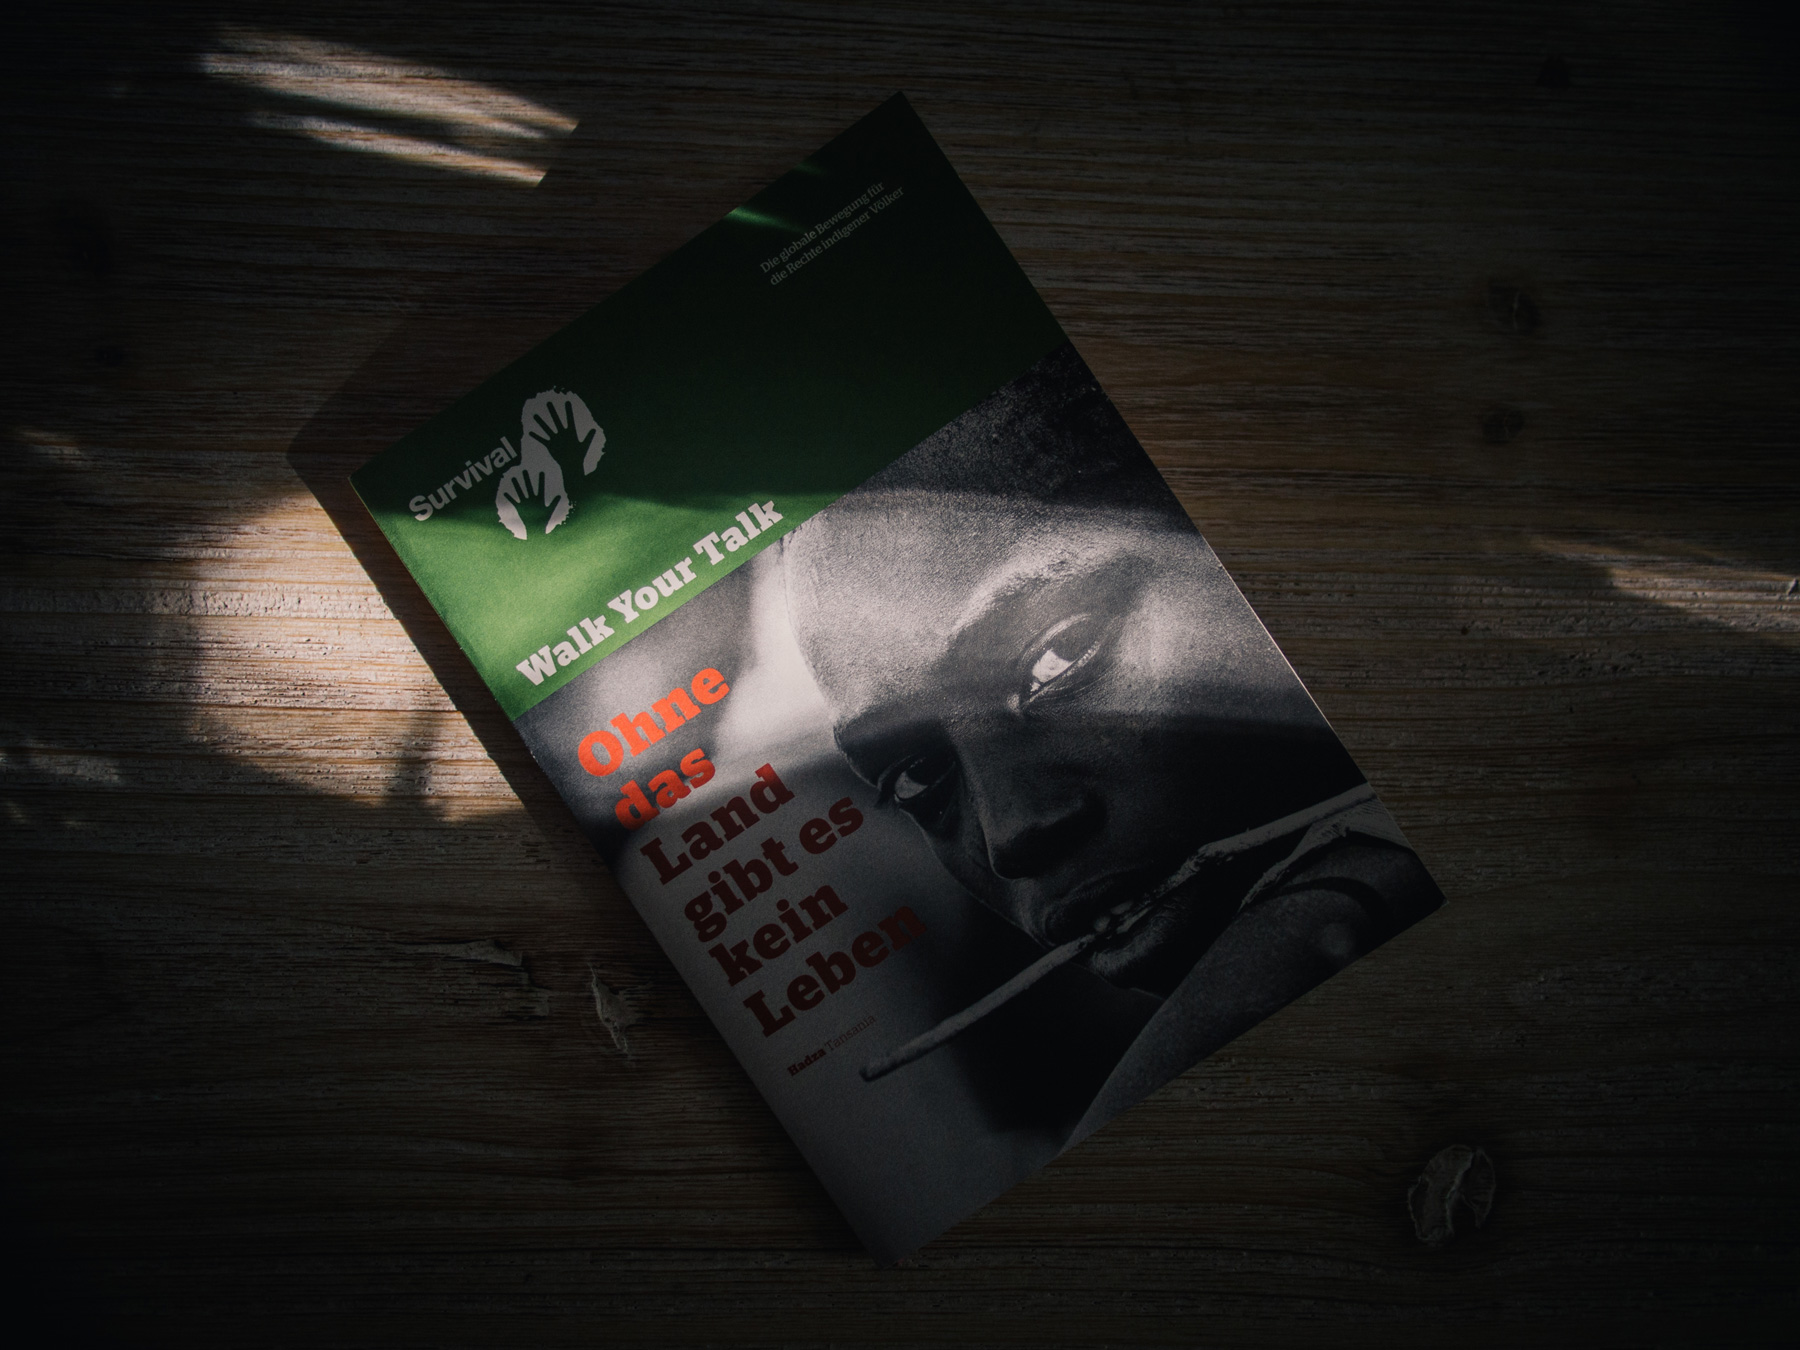 Abbildung des Covers des Handbuchs